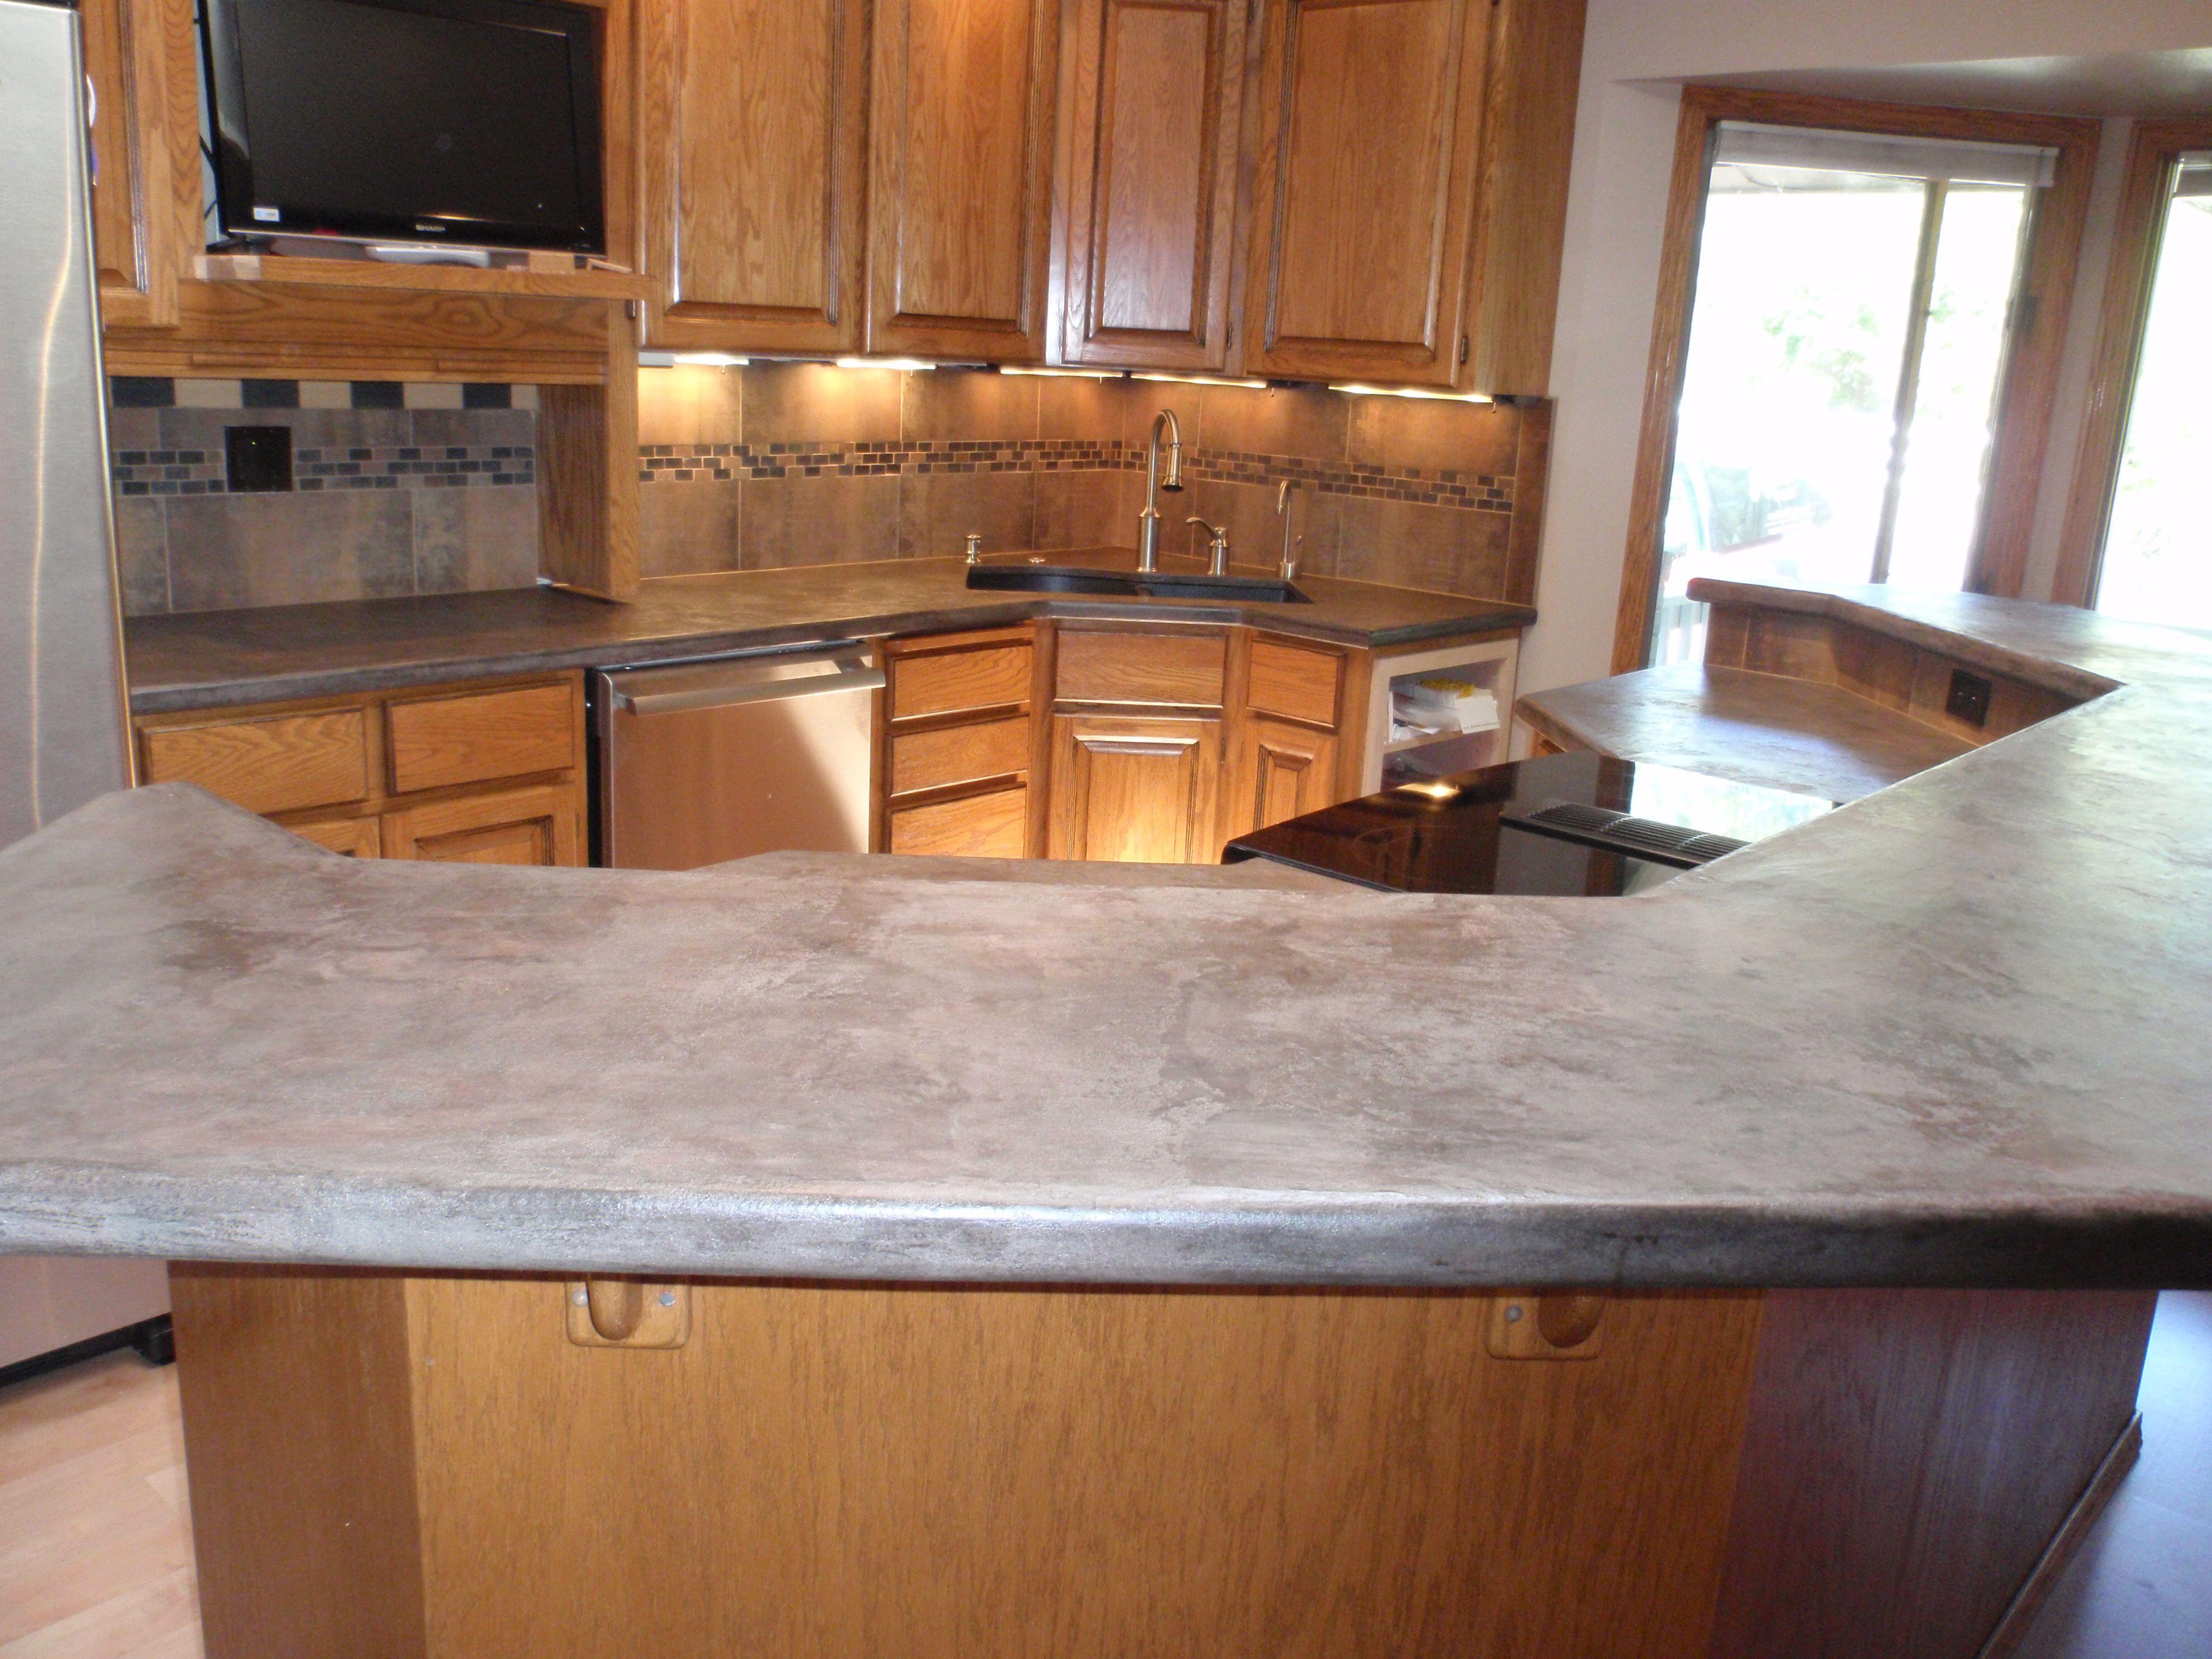 - Skimstone Kitchen Cabinets And Countertops, Kitchen Countertops